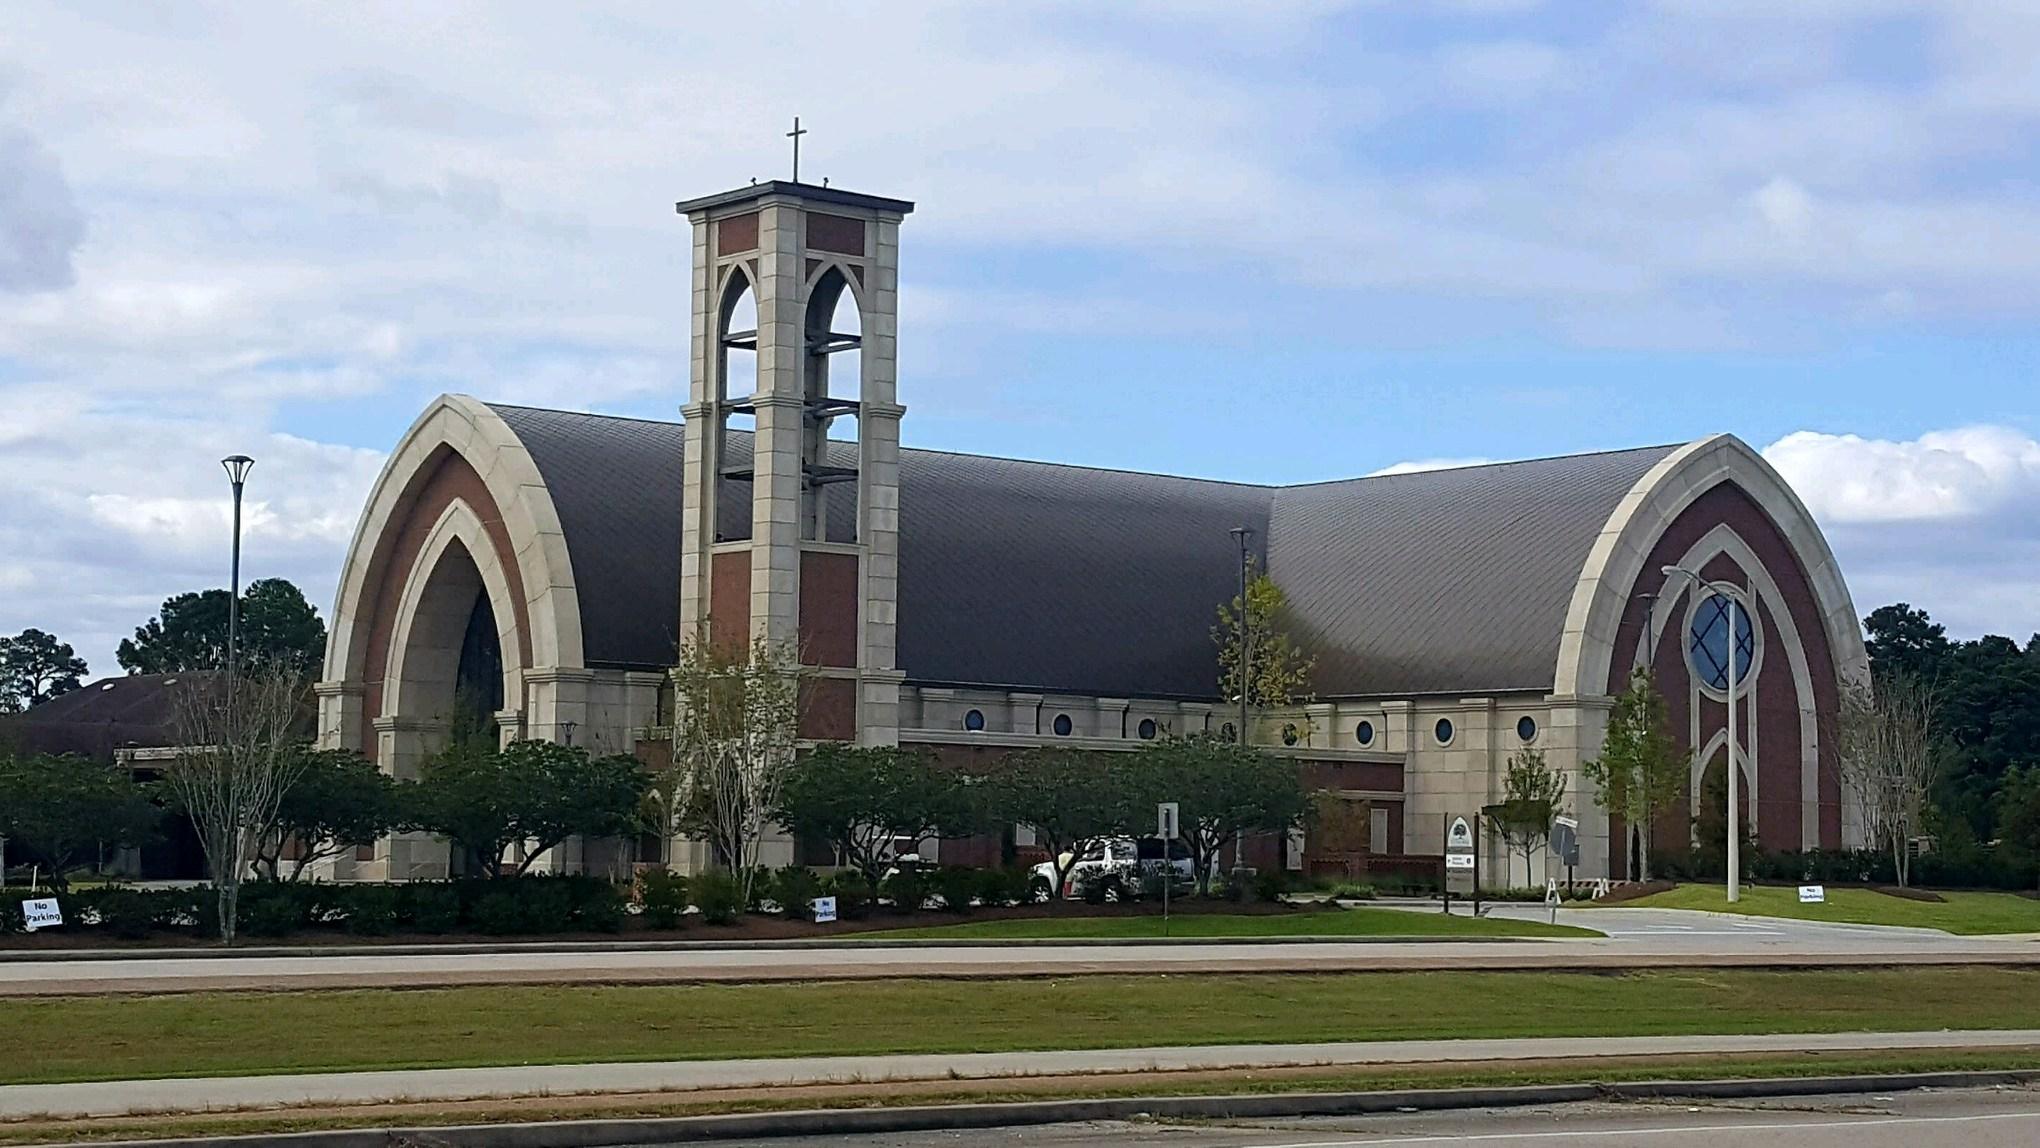 St. Joseph Cathedral, Baton Rouge